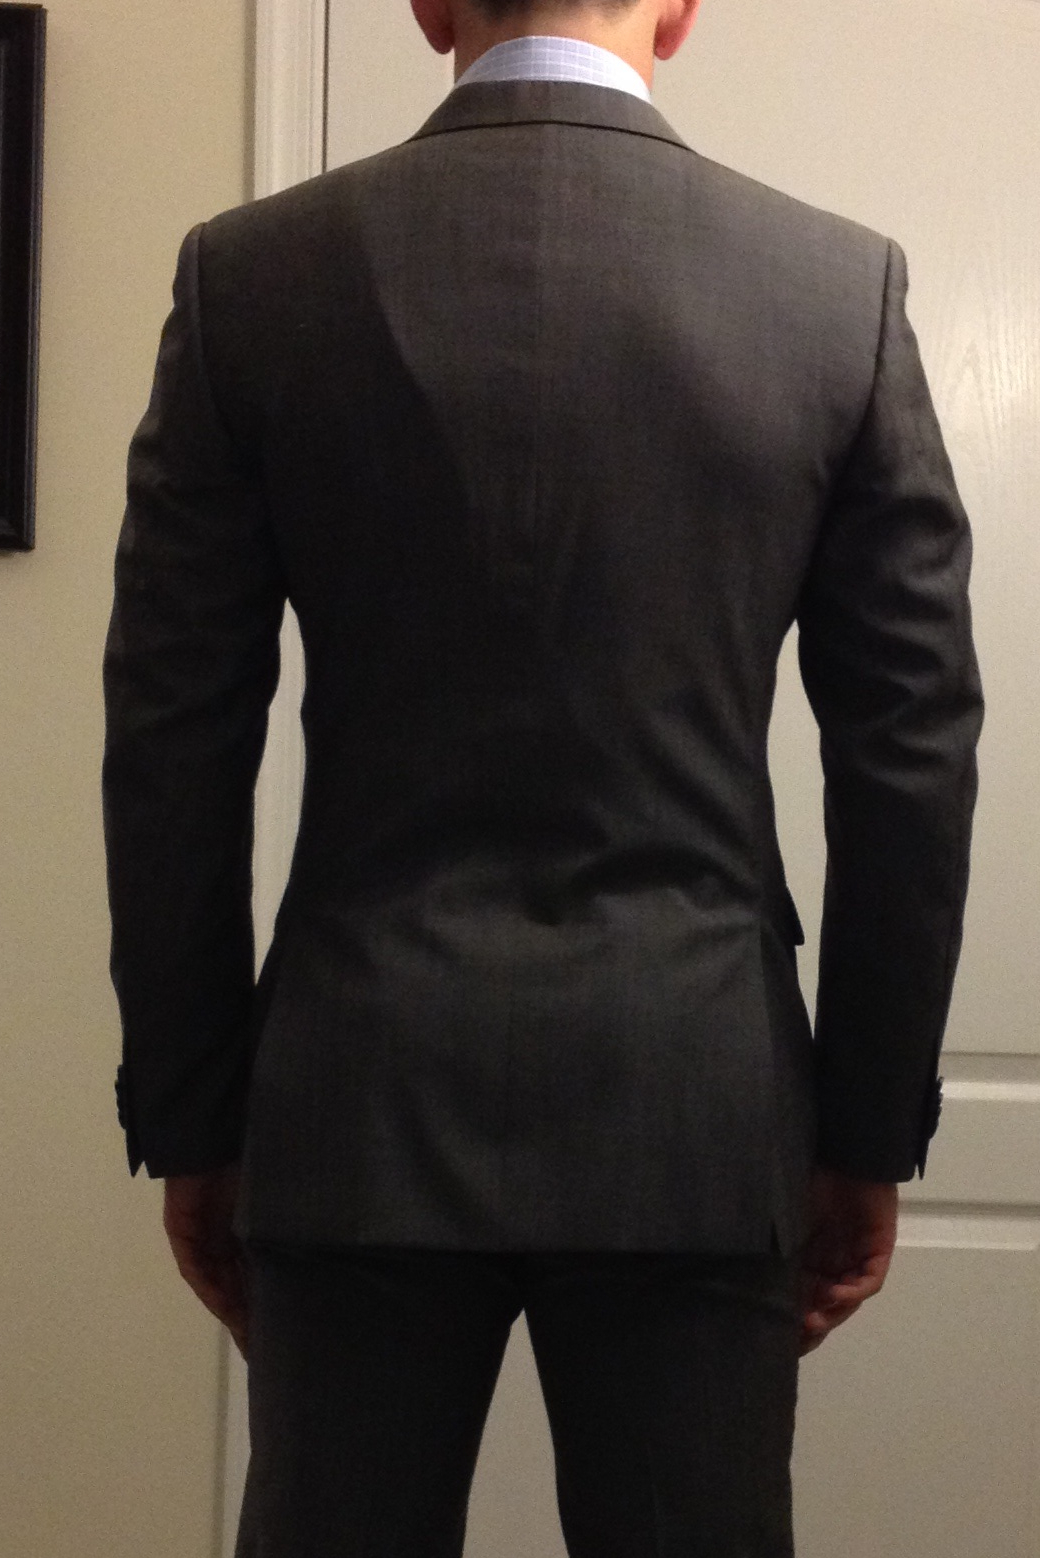 Selected Homme Slim Fit Suit Jacket In Navy Pinstripe. $ MIX & MATCH. ASOS DESIGN Wedding Slim Suit Jacket In Pastel Blue. $ MIX & MATCH. ASOS DESIGN wedding slim suit vest in pastel blue. $ ASOS DESIGN Wedding Slim Suit Pants In Pine Green. $